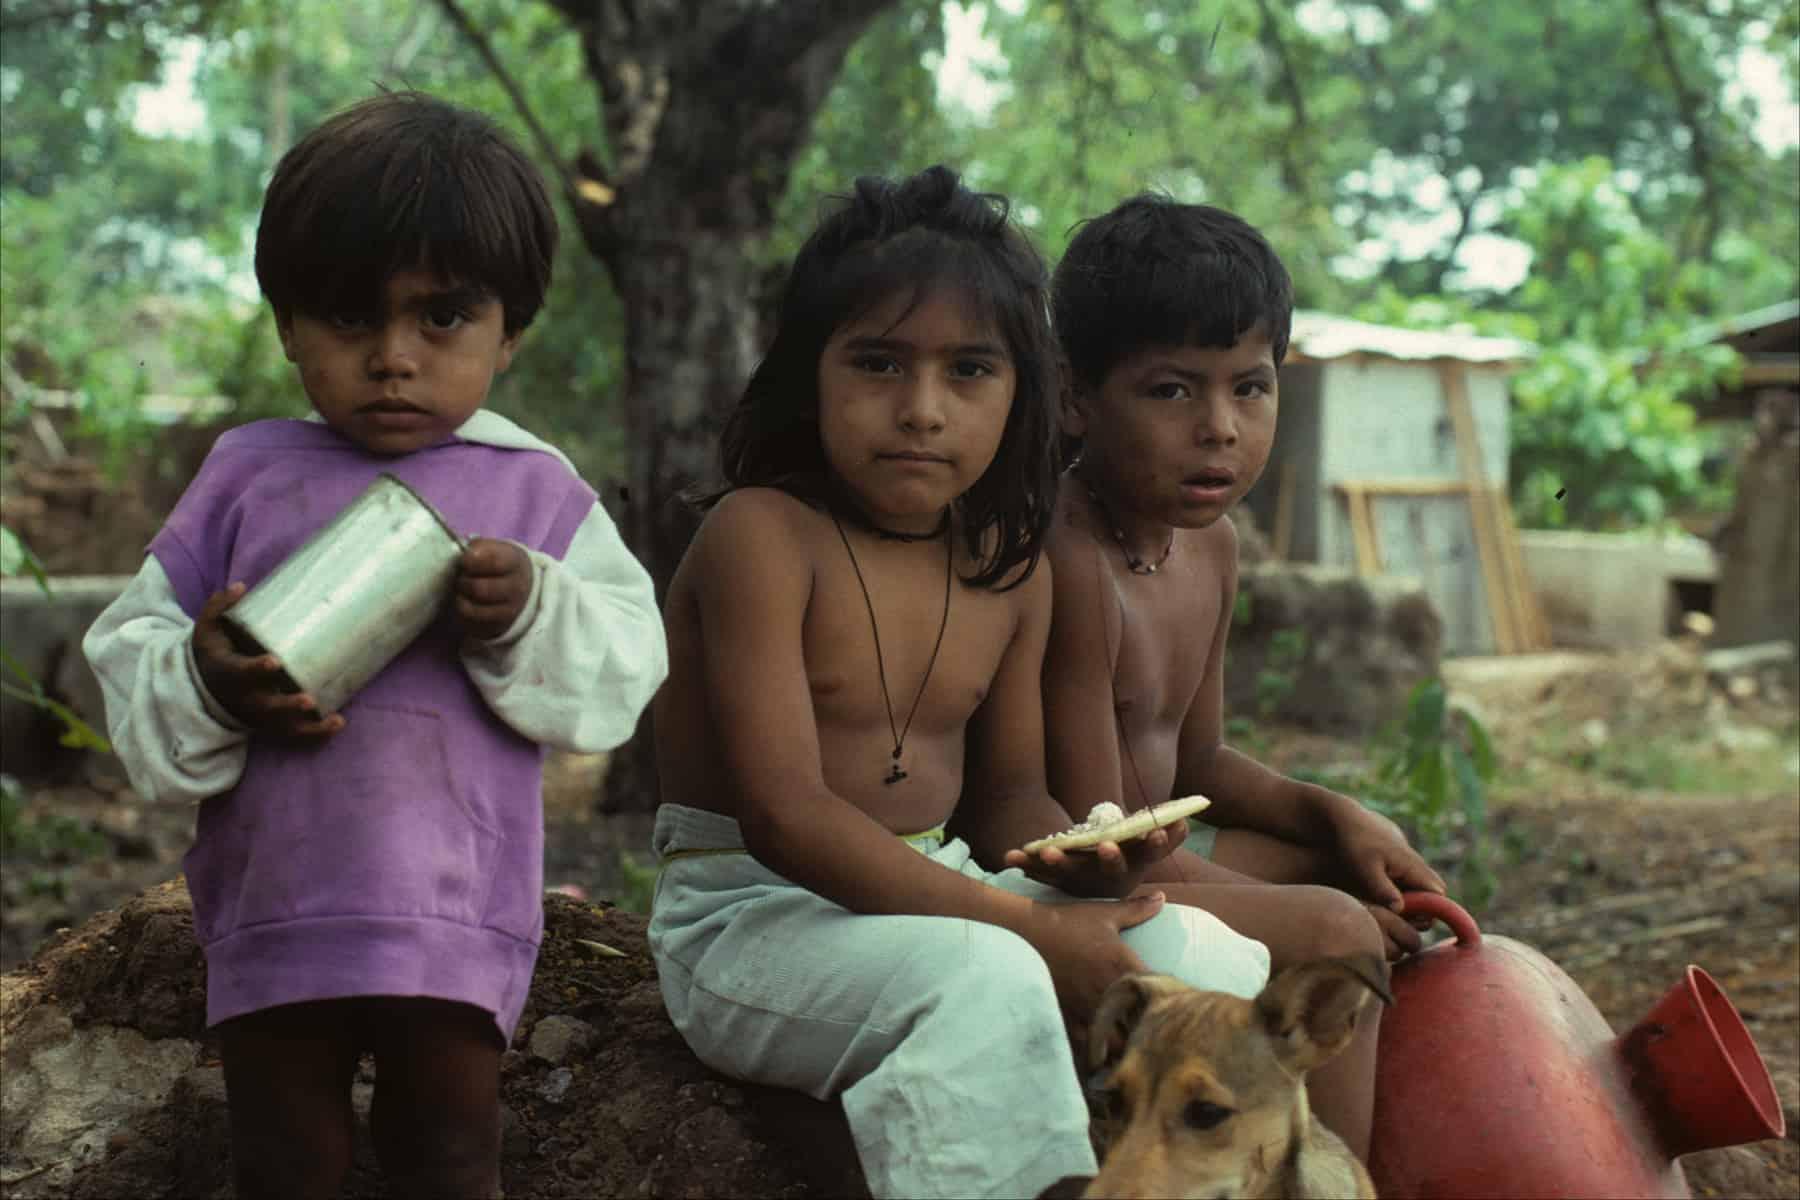 children: asylum